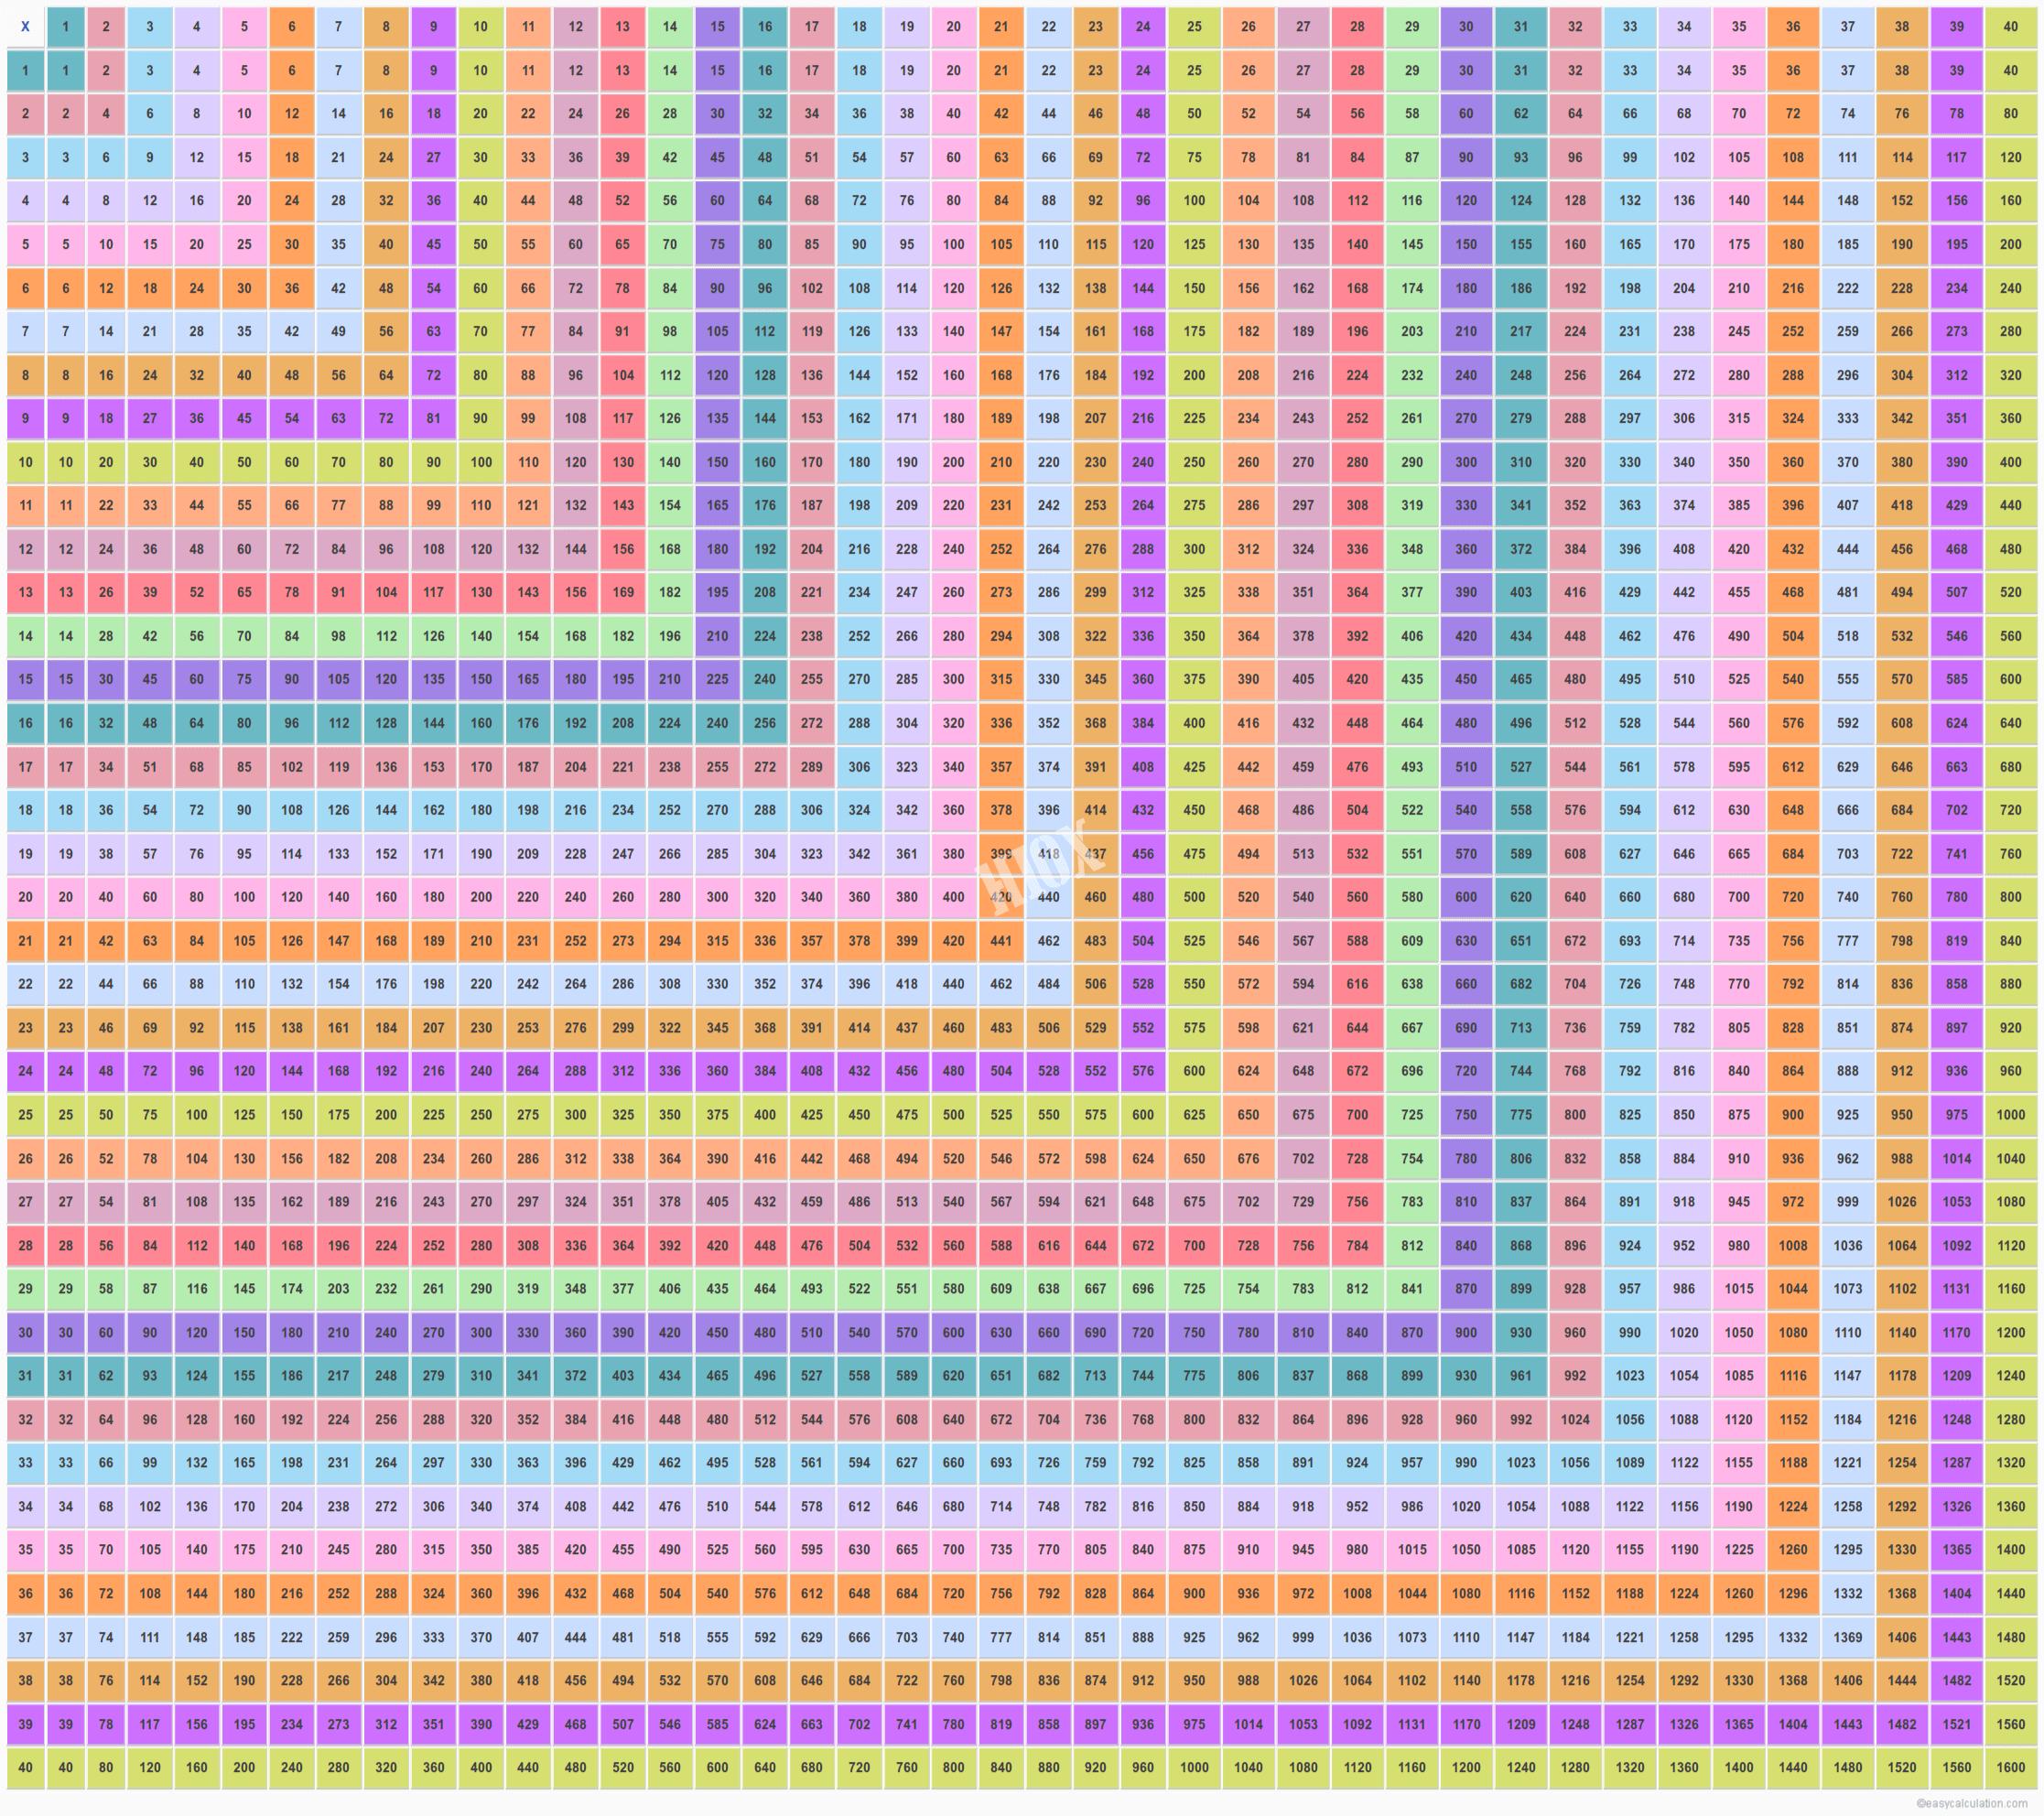 40×40 Multiplication Table | Multiplication Table